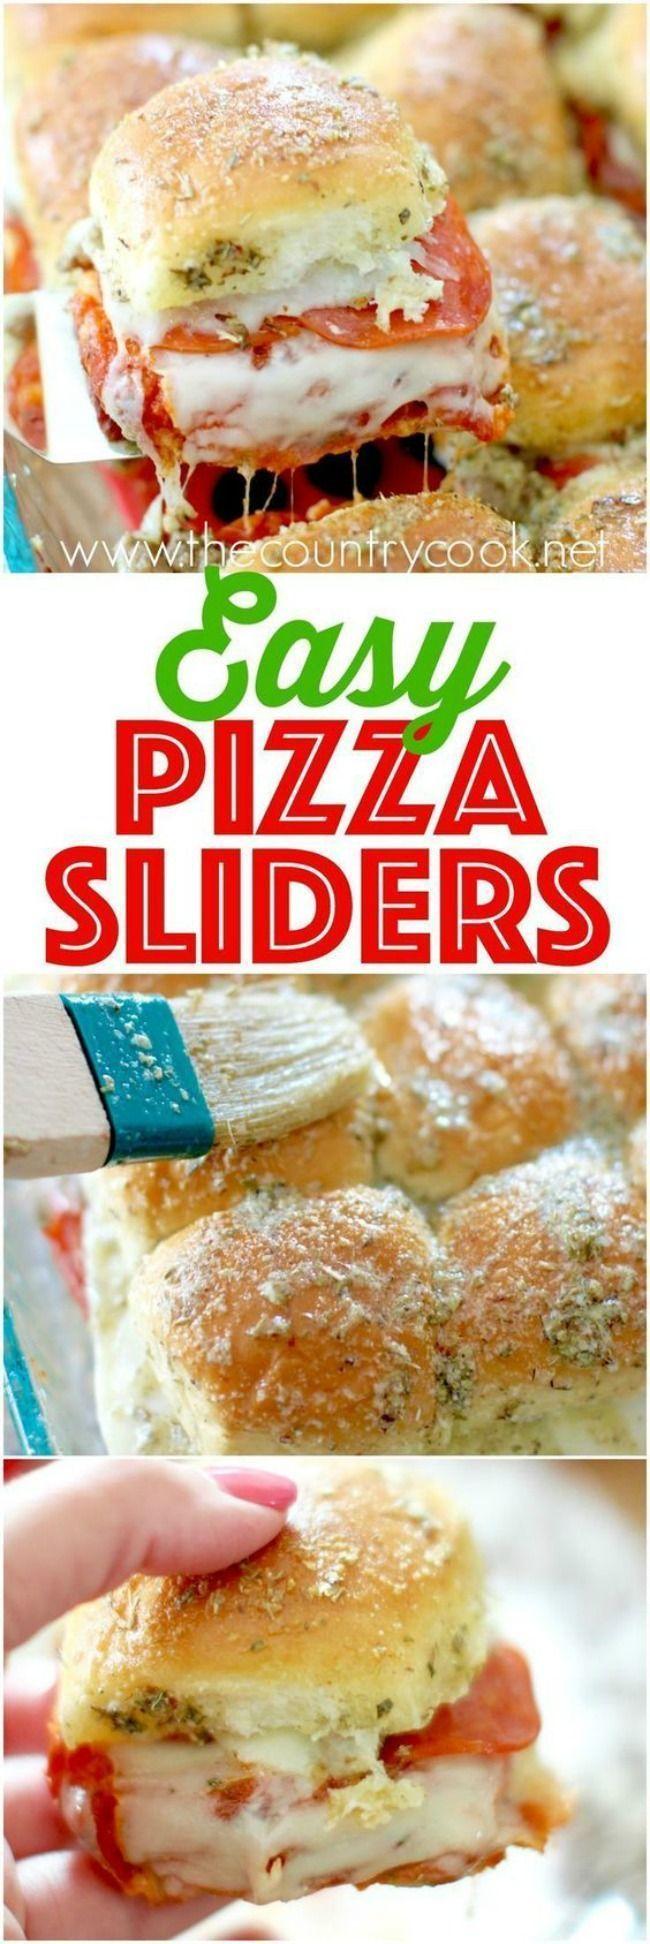 The 11 Best Slider Recipes #tailgatefood